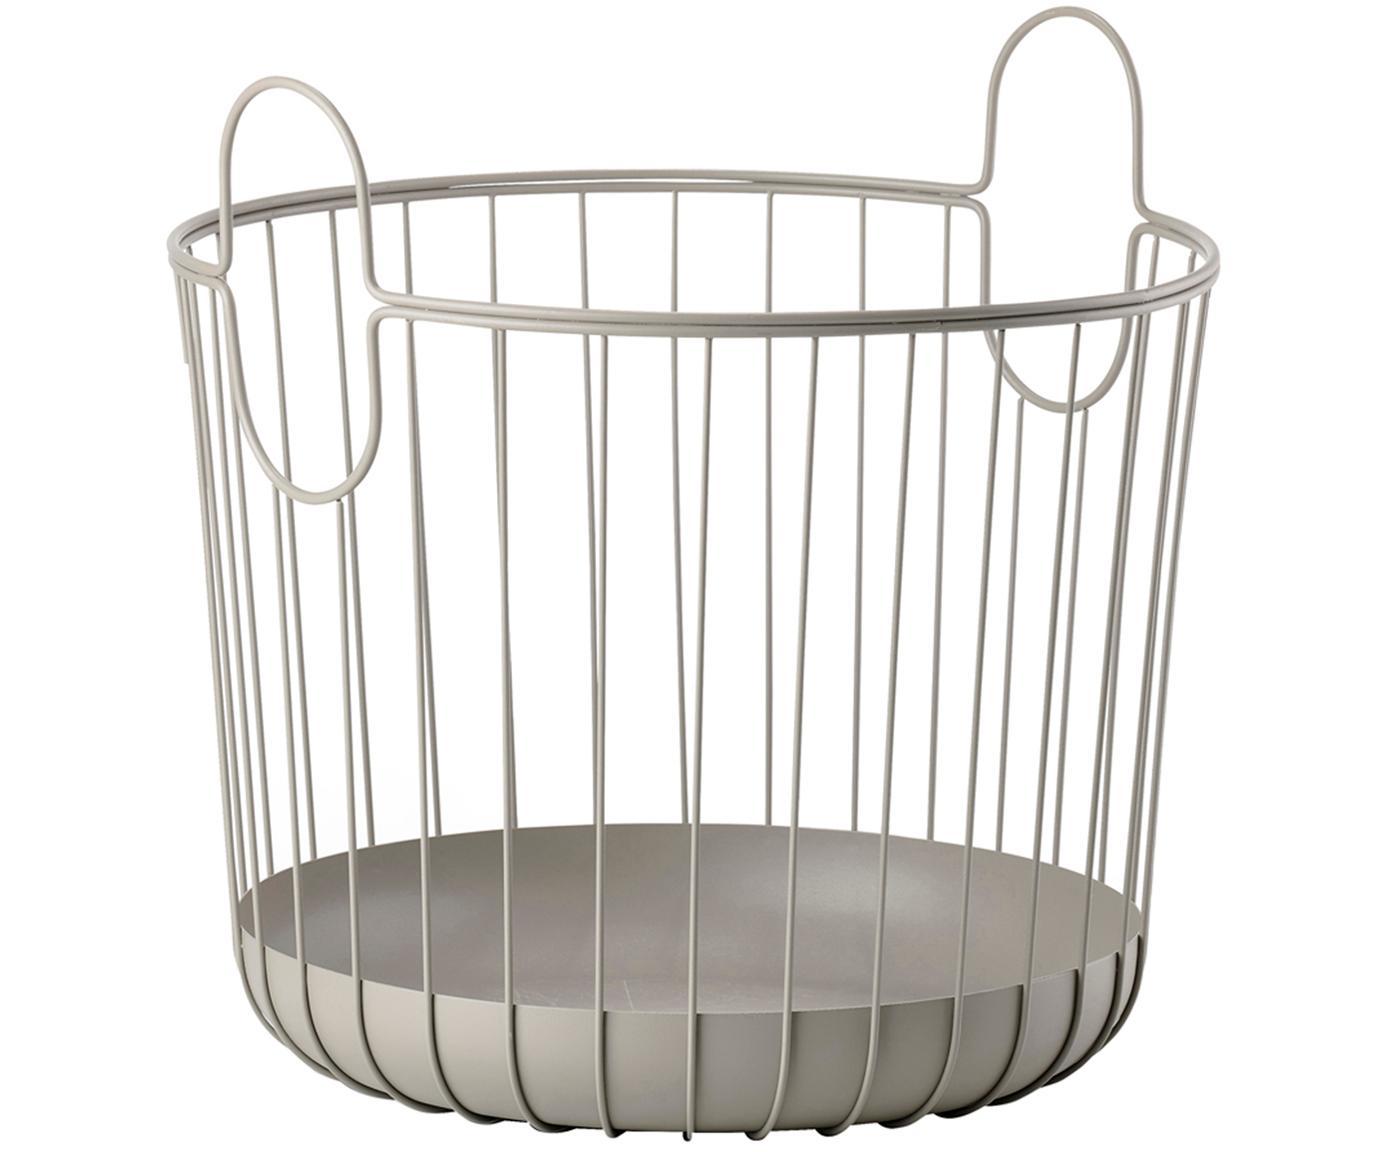 Cesta Ina, Metal, Marrón, Ø 30 x Al 31 cm